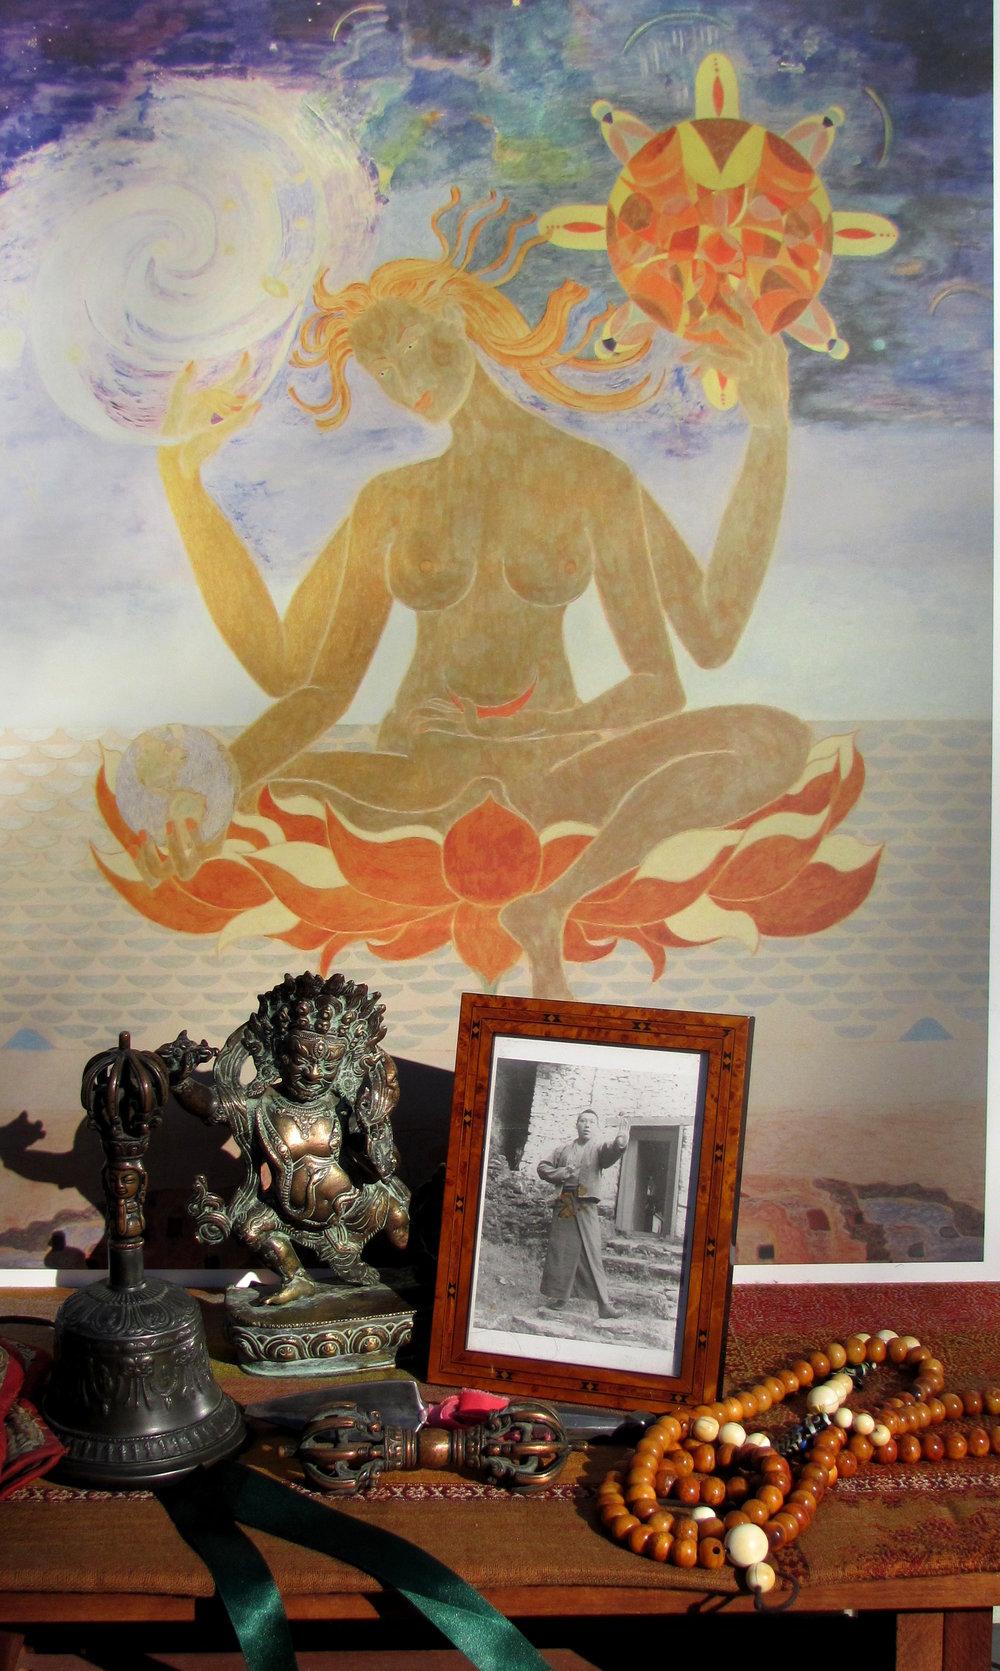 Seonaidh Yeshe Tungpa's practice supports: bell, meteorite phurba, dorje, mala,Vajrapani, Trungpa Rinpoche photo, 4-armed deity painting.